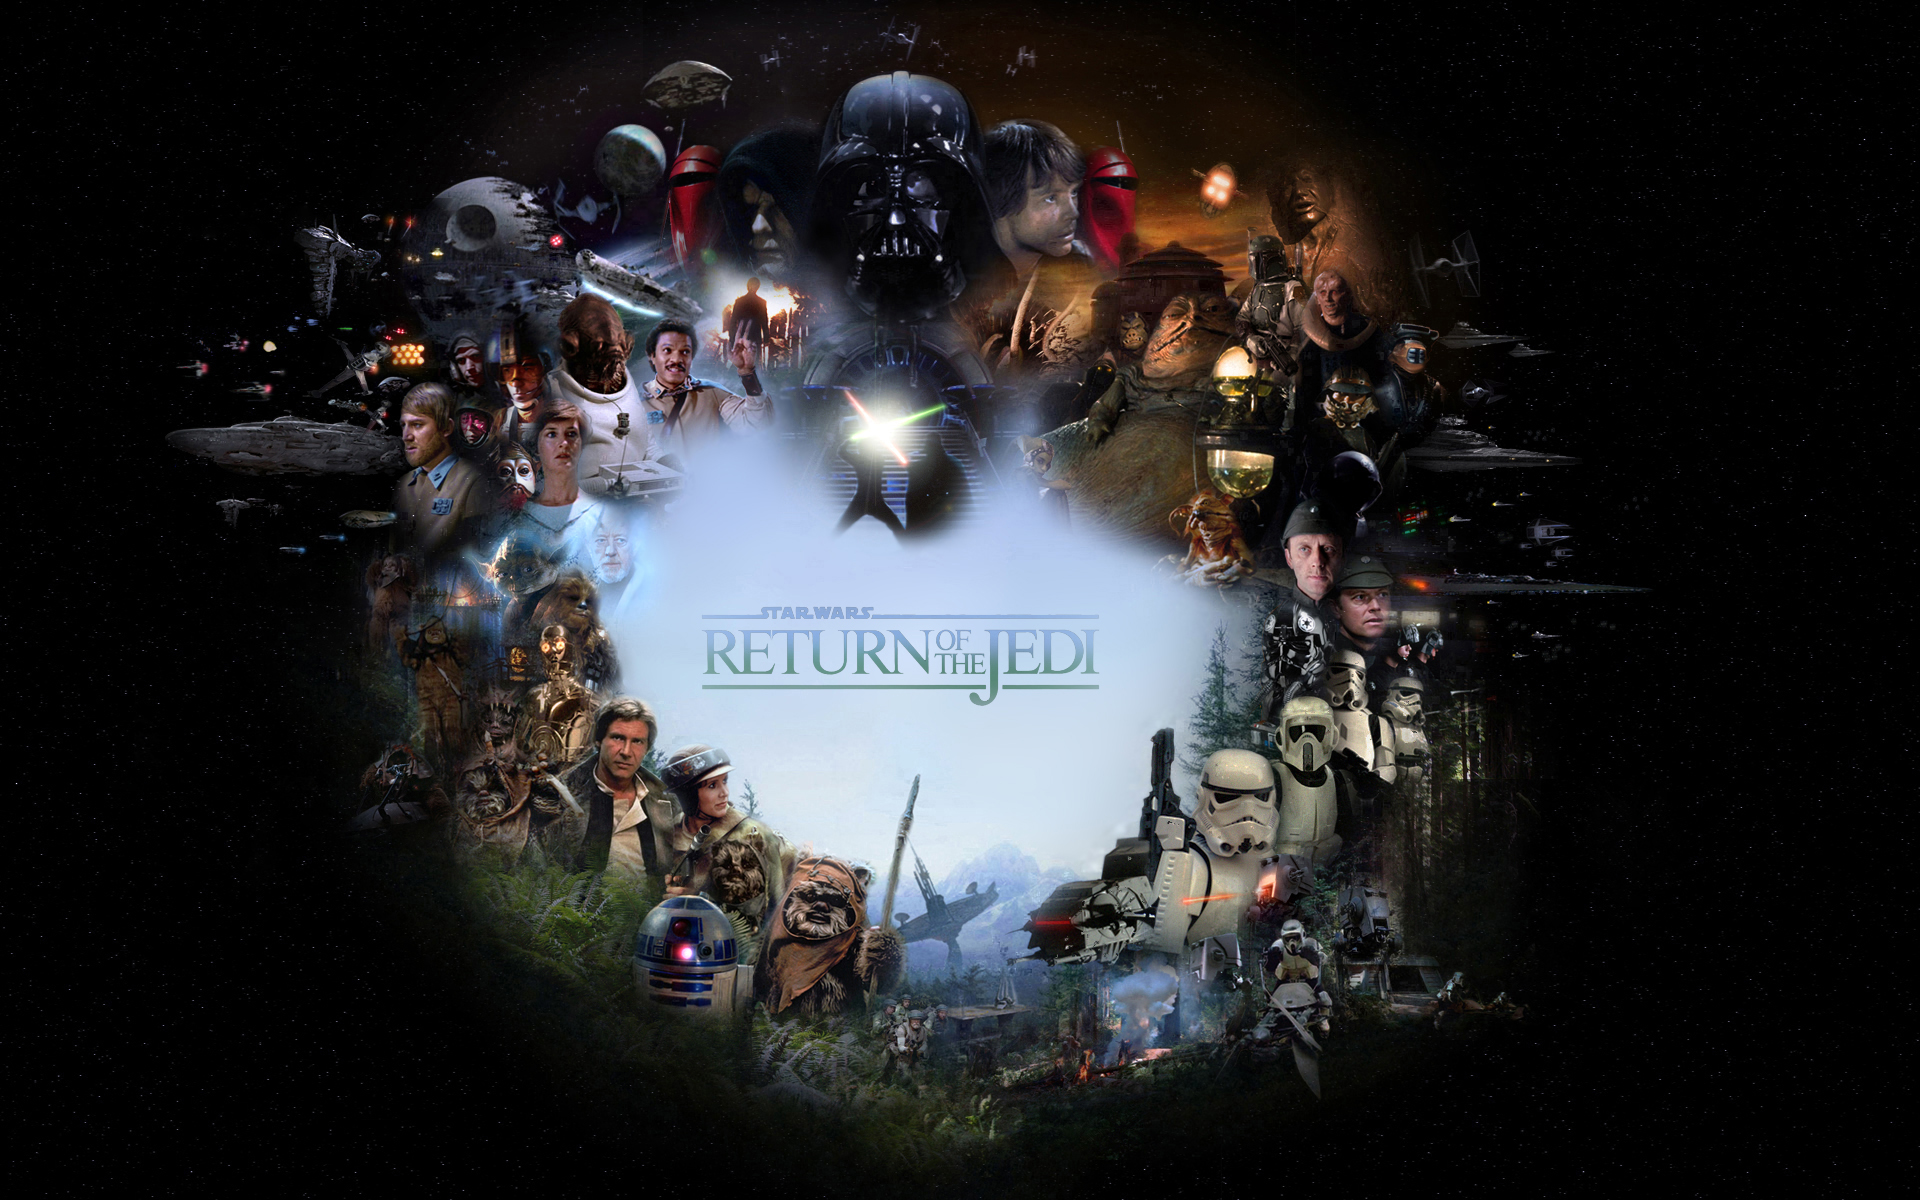 50 Return Of The Jedi Wallpaper On Wallpapersafari